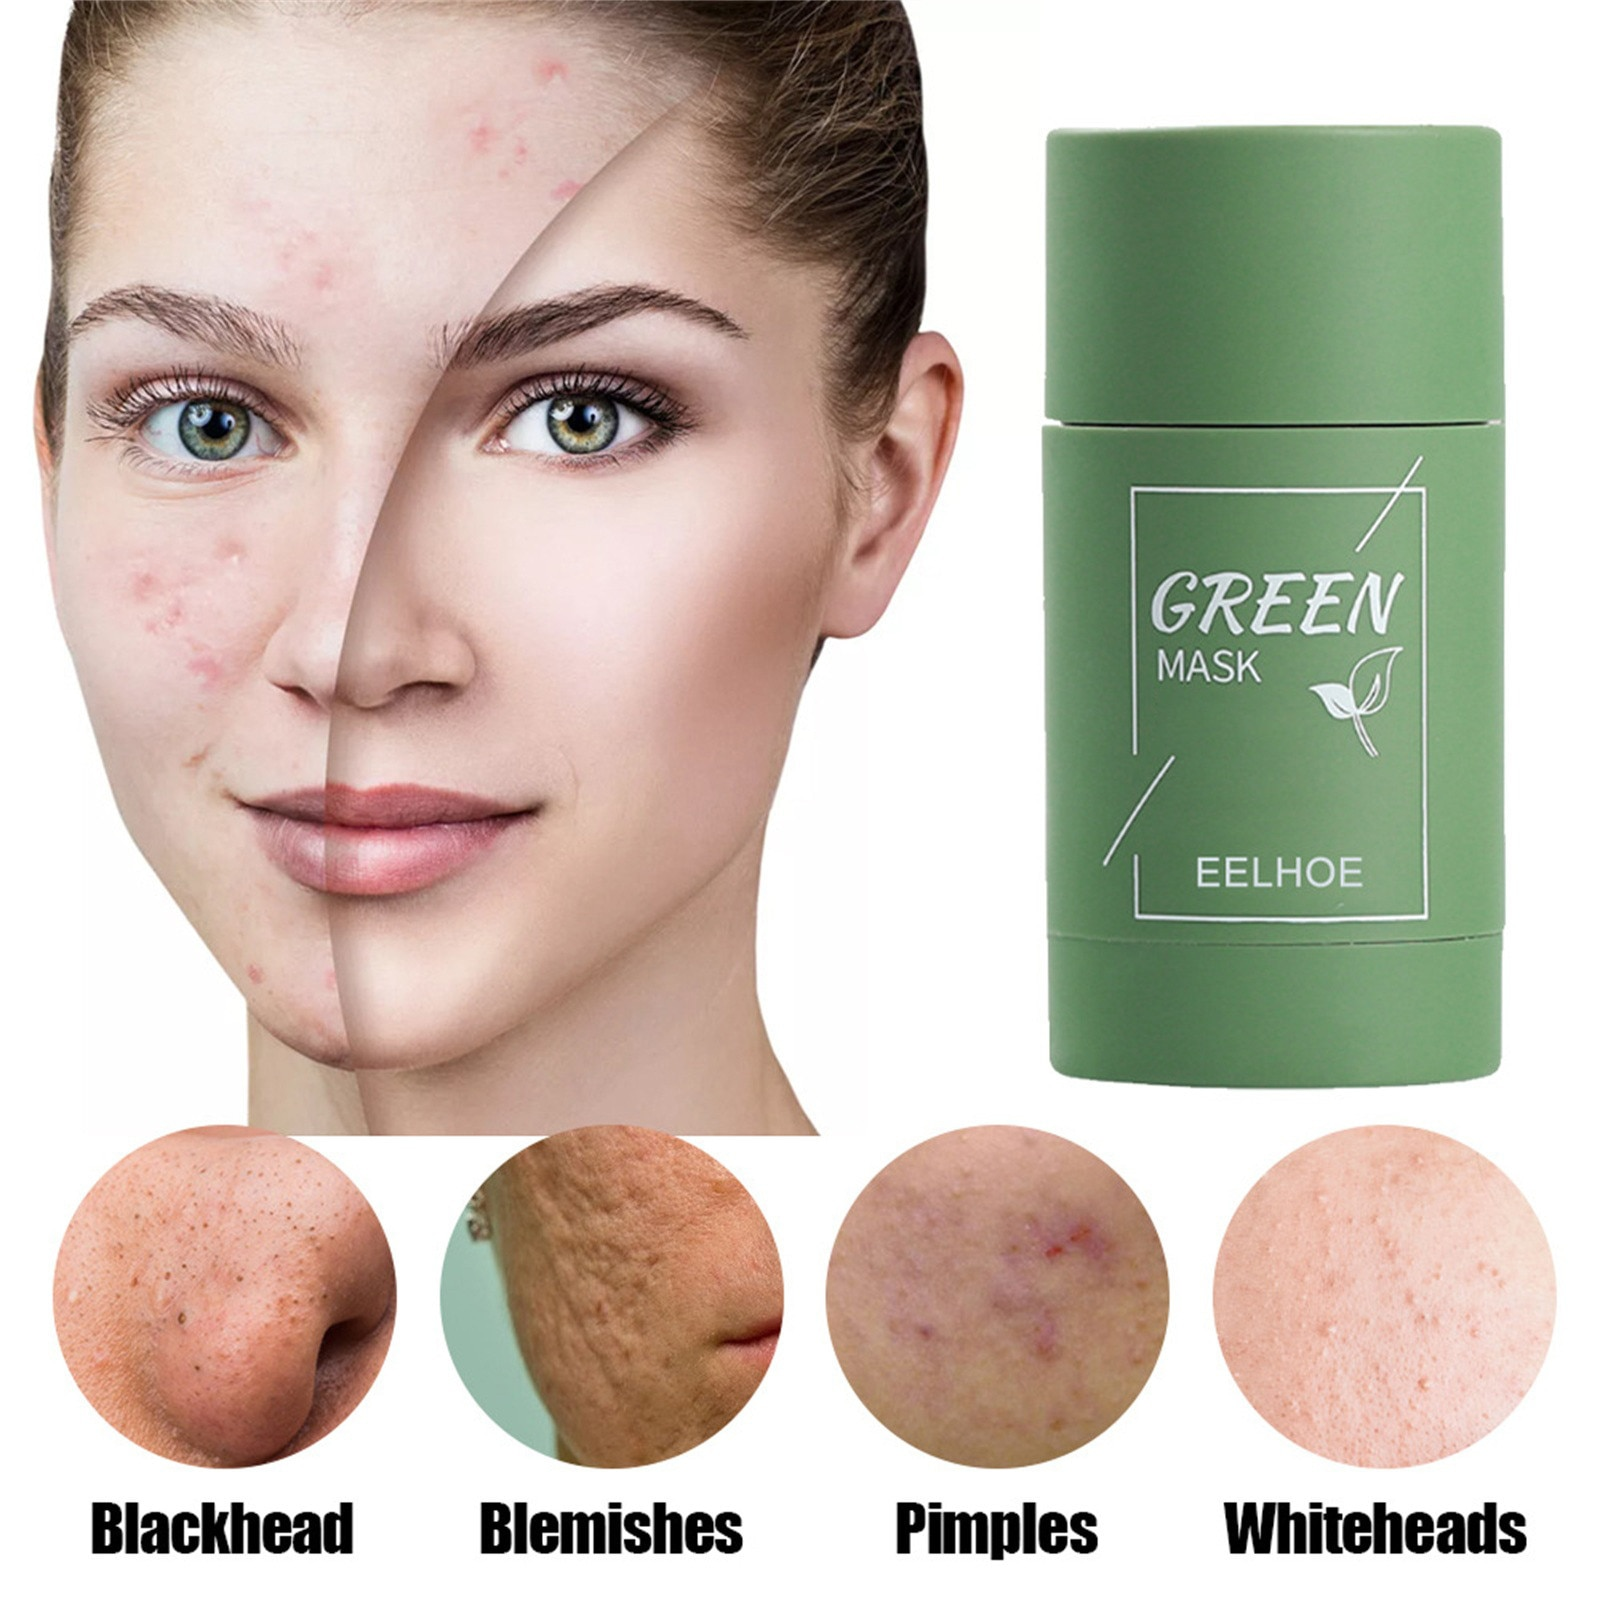 HAICAR Personal Skin Care Face masks Face cream green mask stick Green Tea Purifying Mask Oil Contro